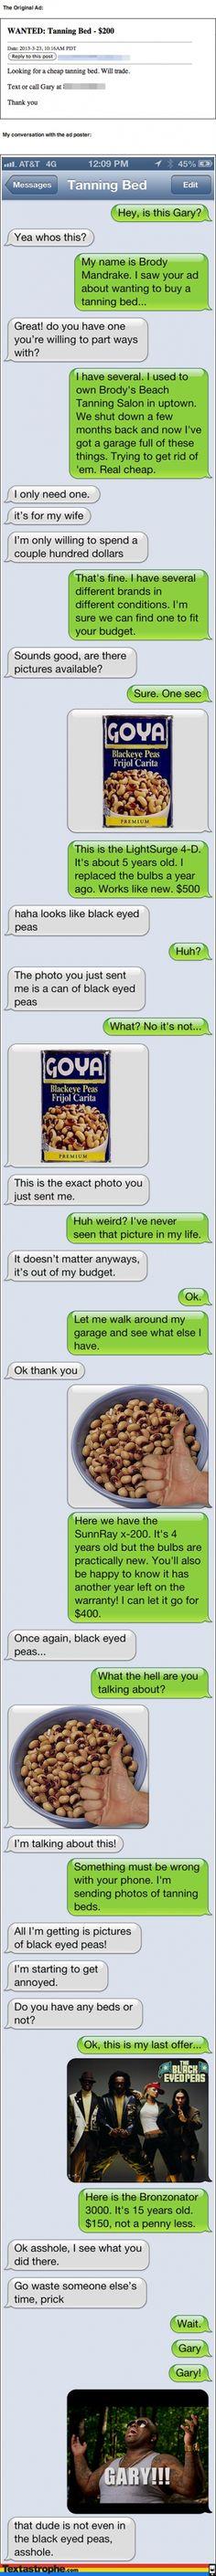 texting lols